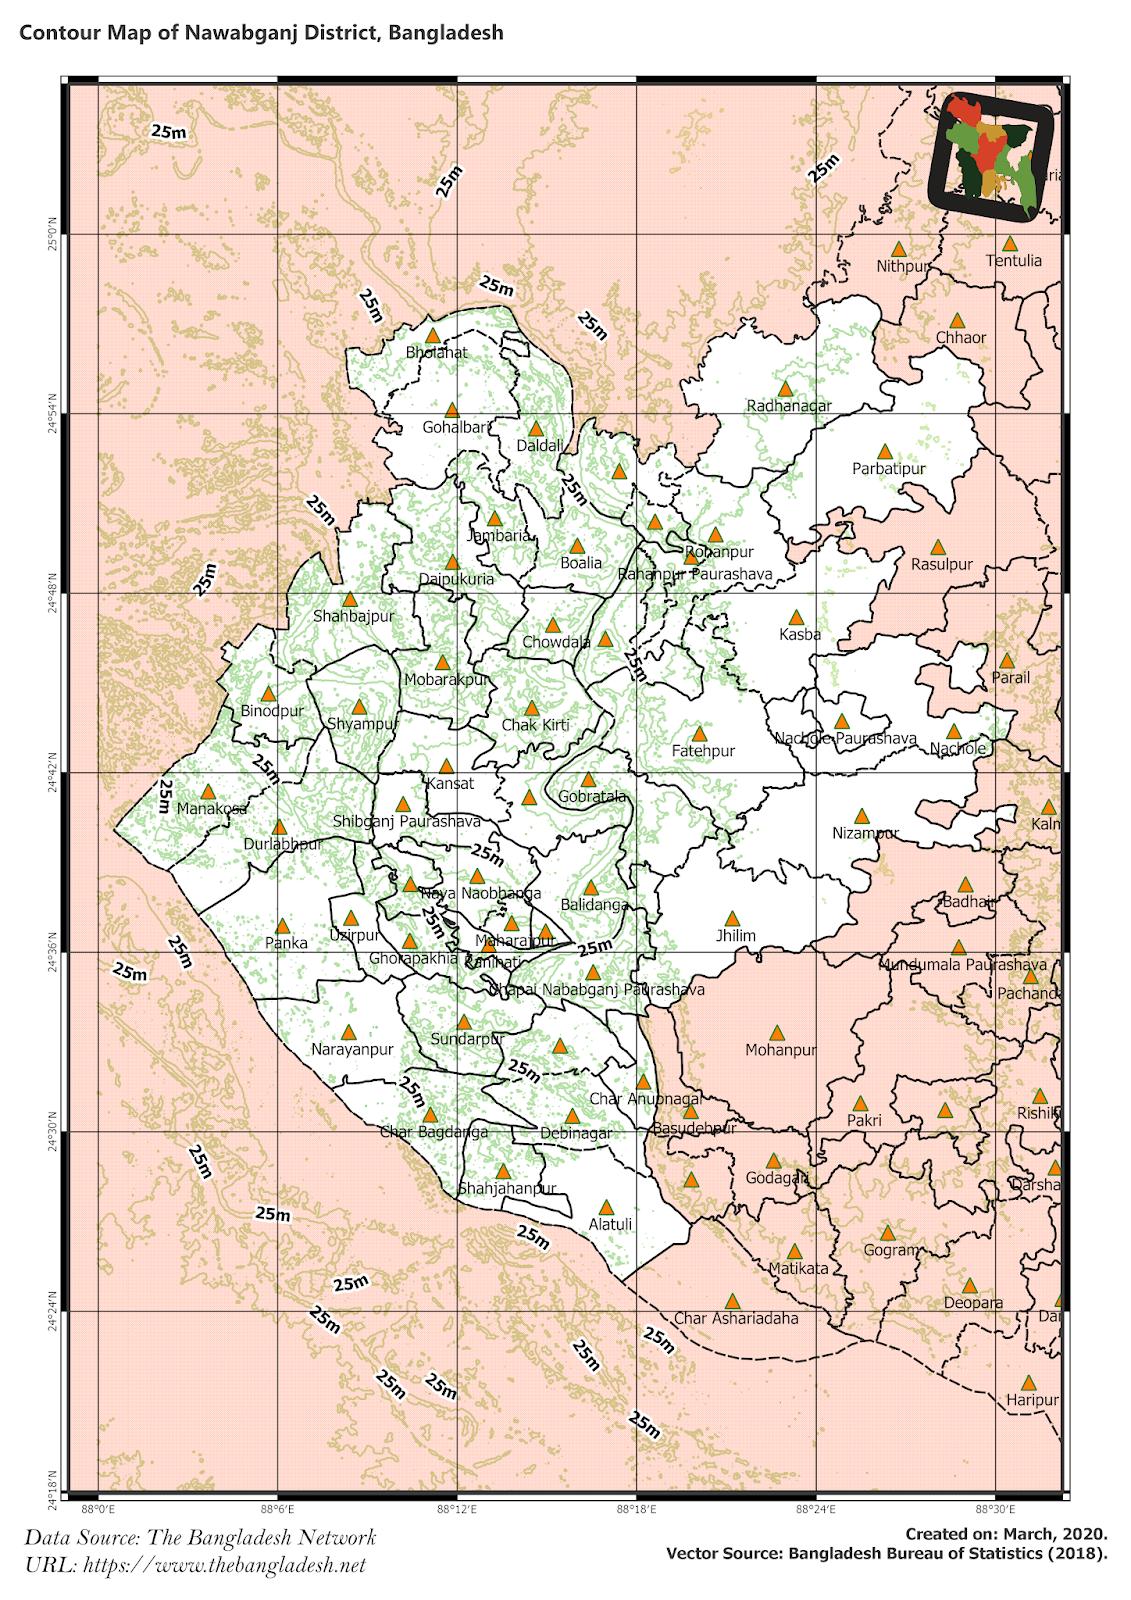 Elevation Map of Nawabganj District of Bangladesh